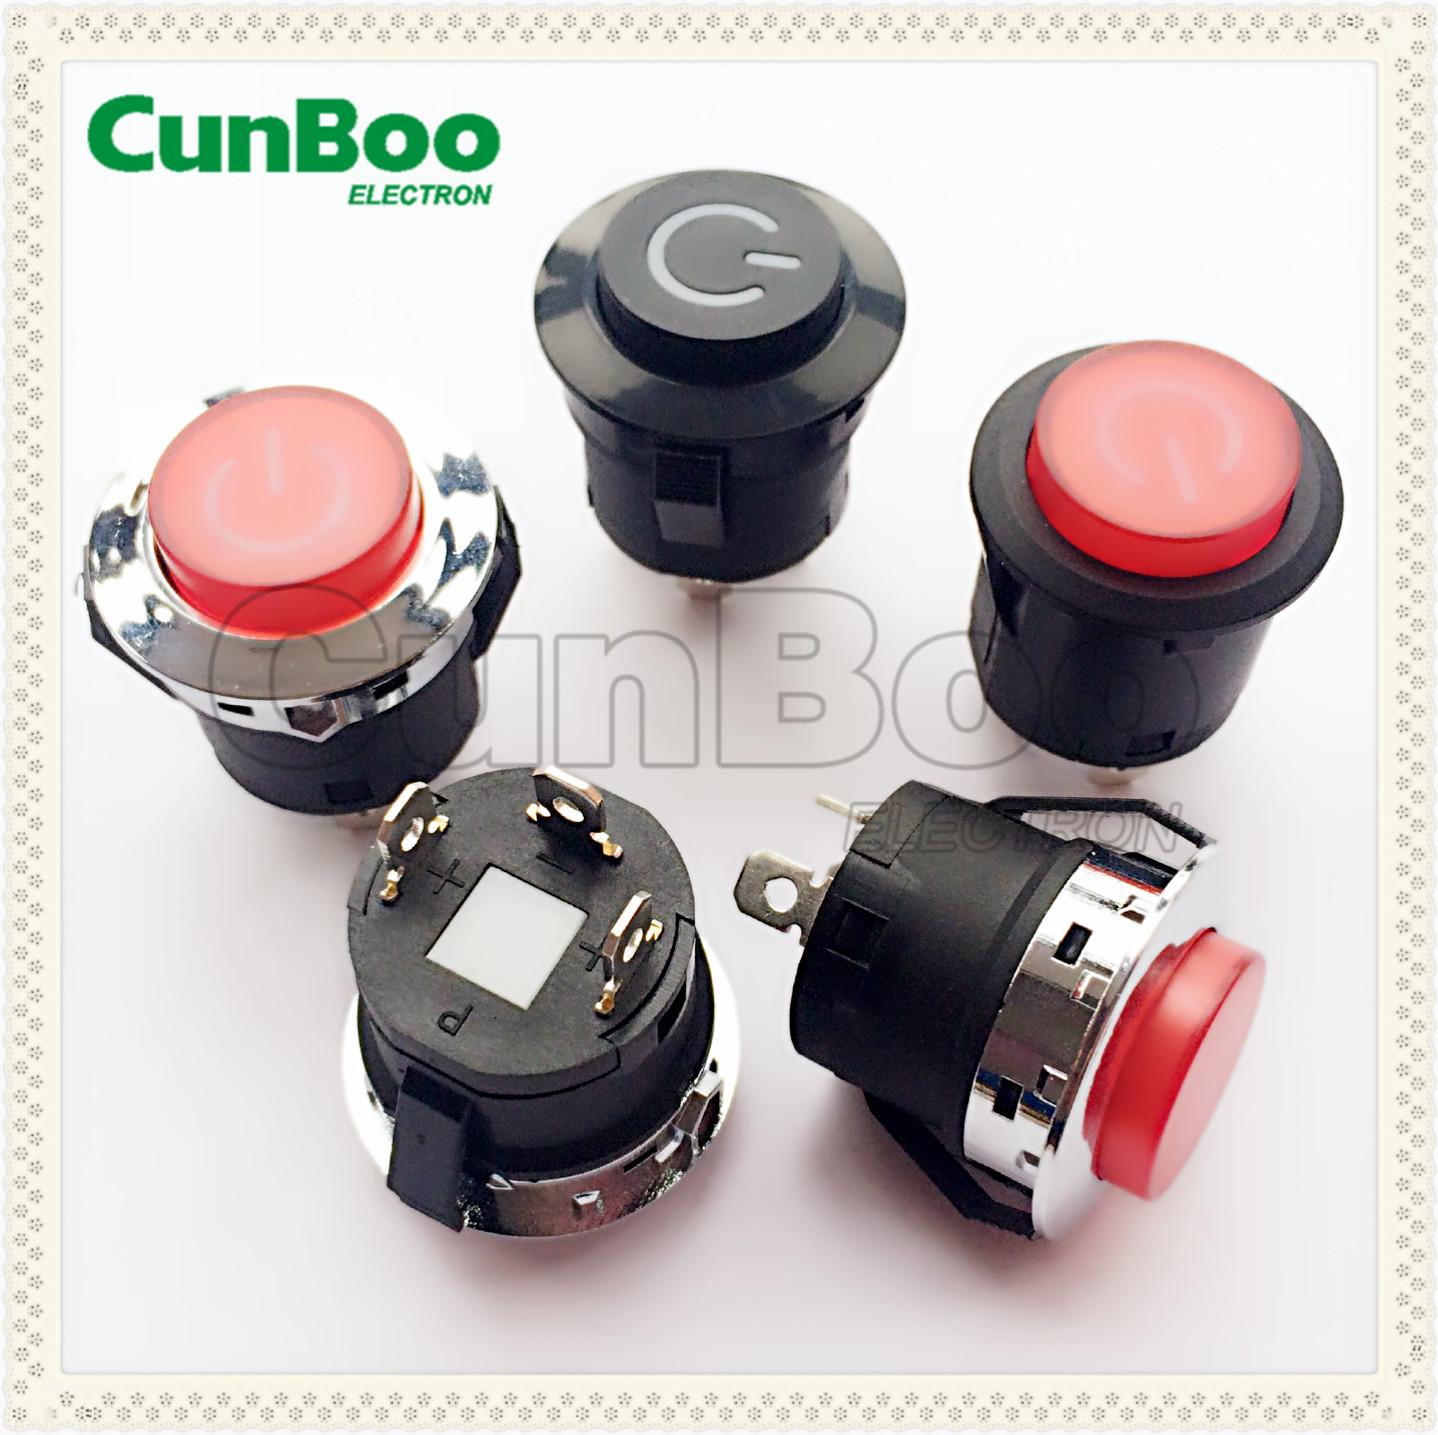 latching push button switch 10A 220v